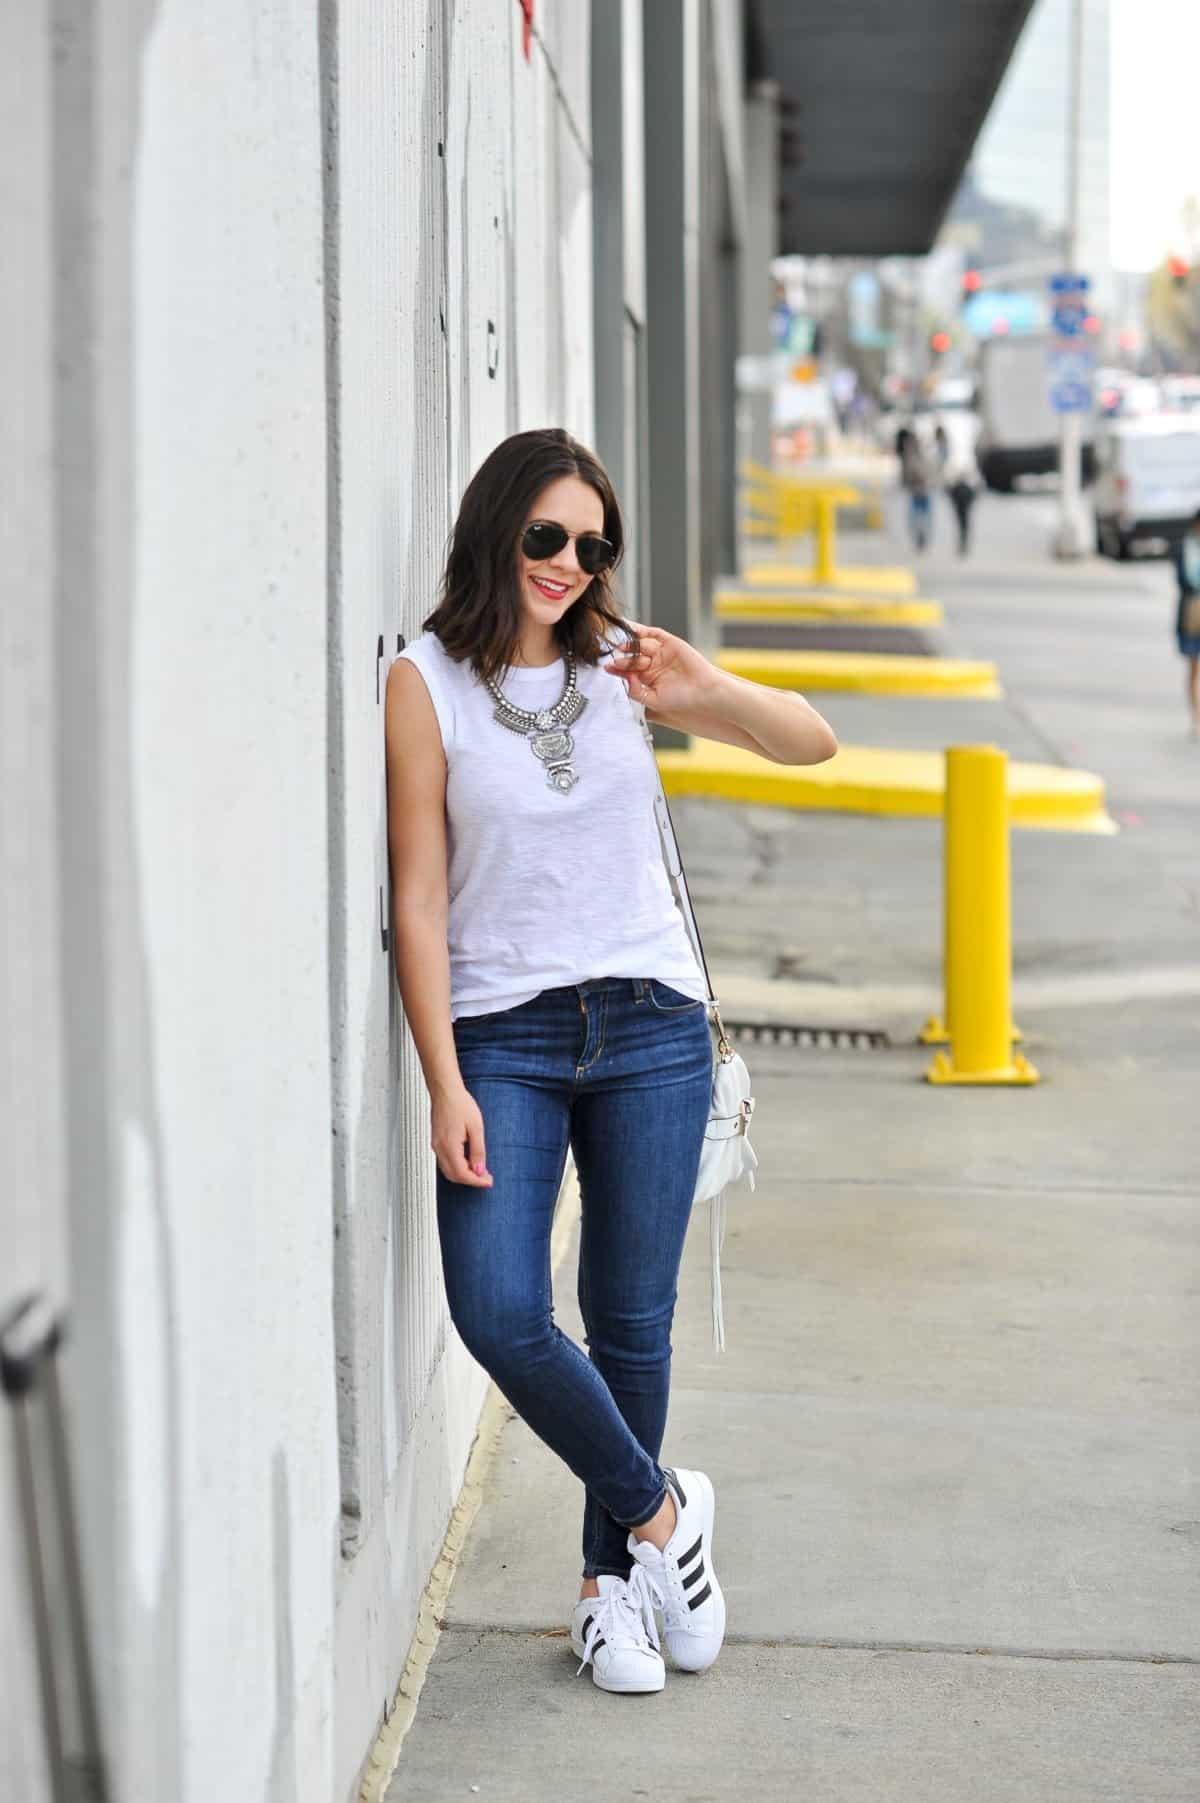 adidas originals, street style, My Style Vita - @mystylevita - 23